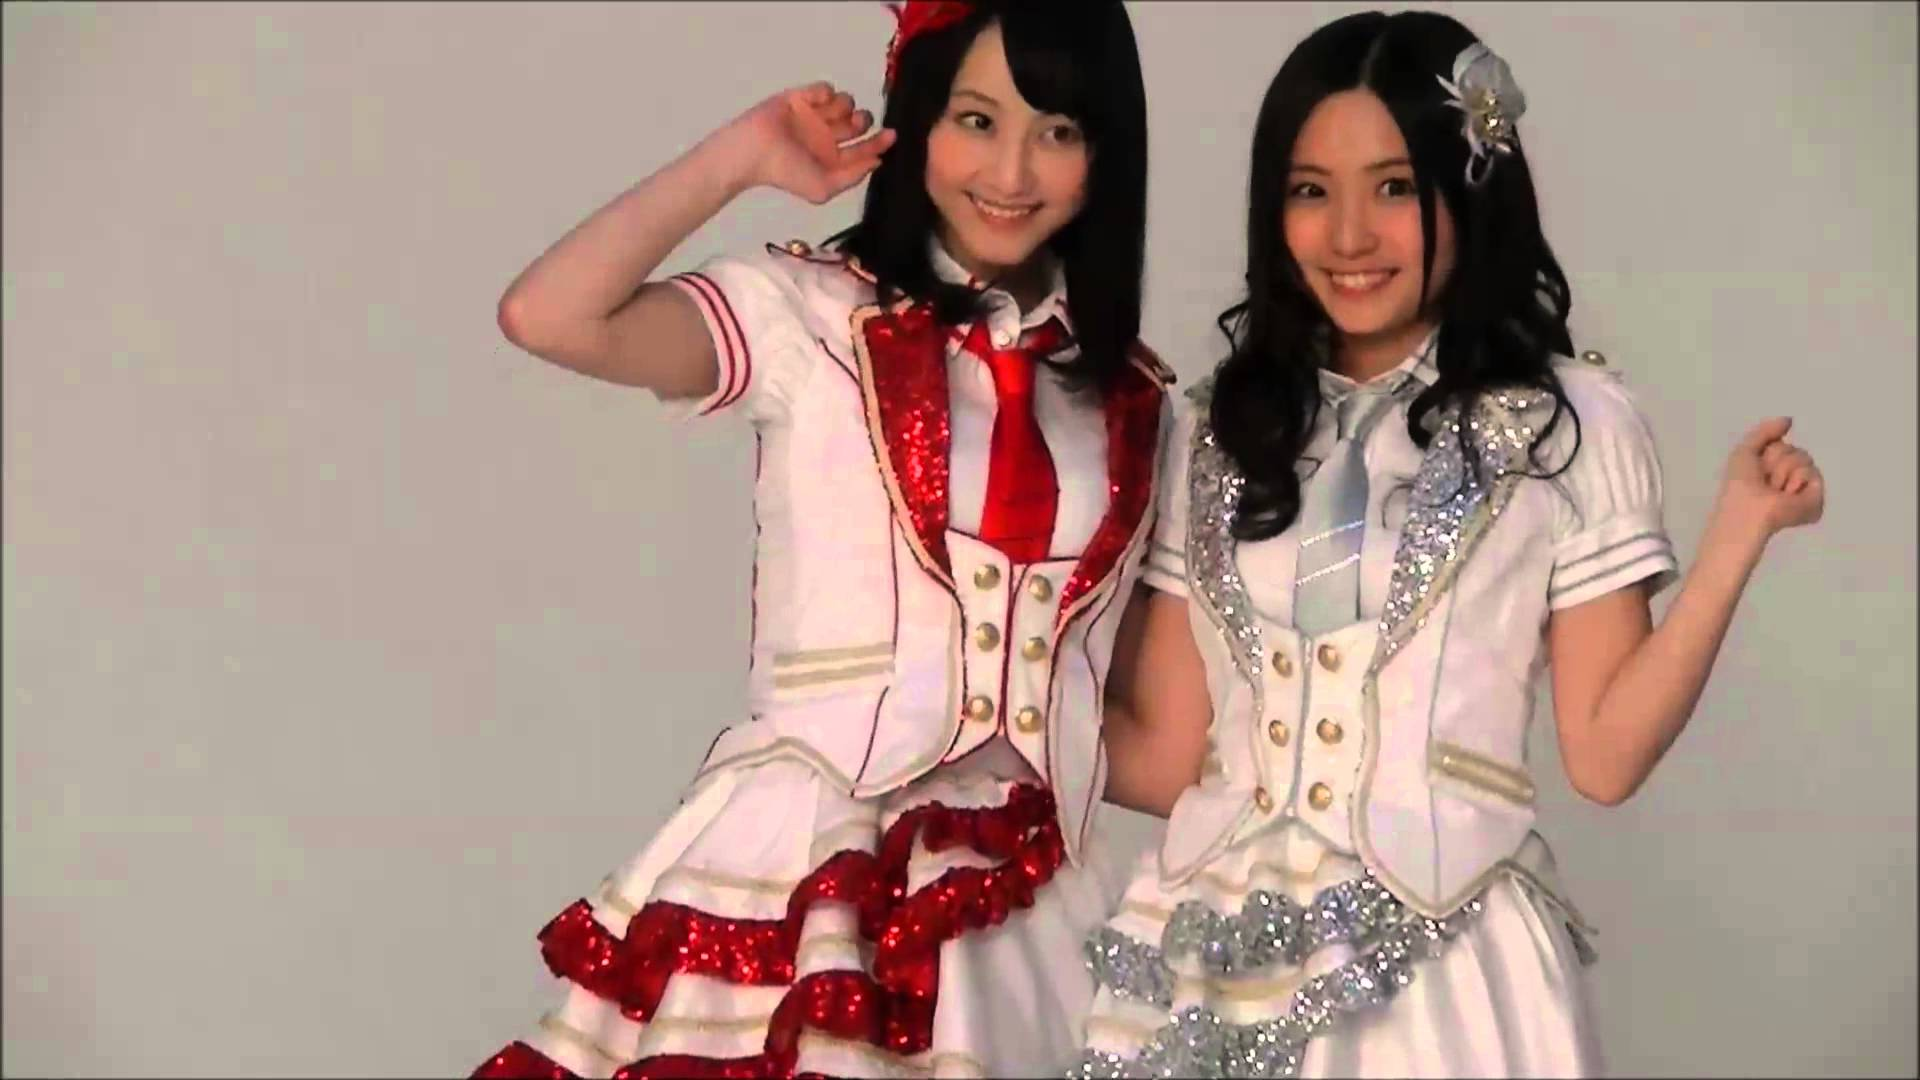 maxresdefault 76.jpg - 元SKE48松井玲奈と古川愛李はとても仲良し。